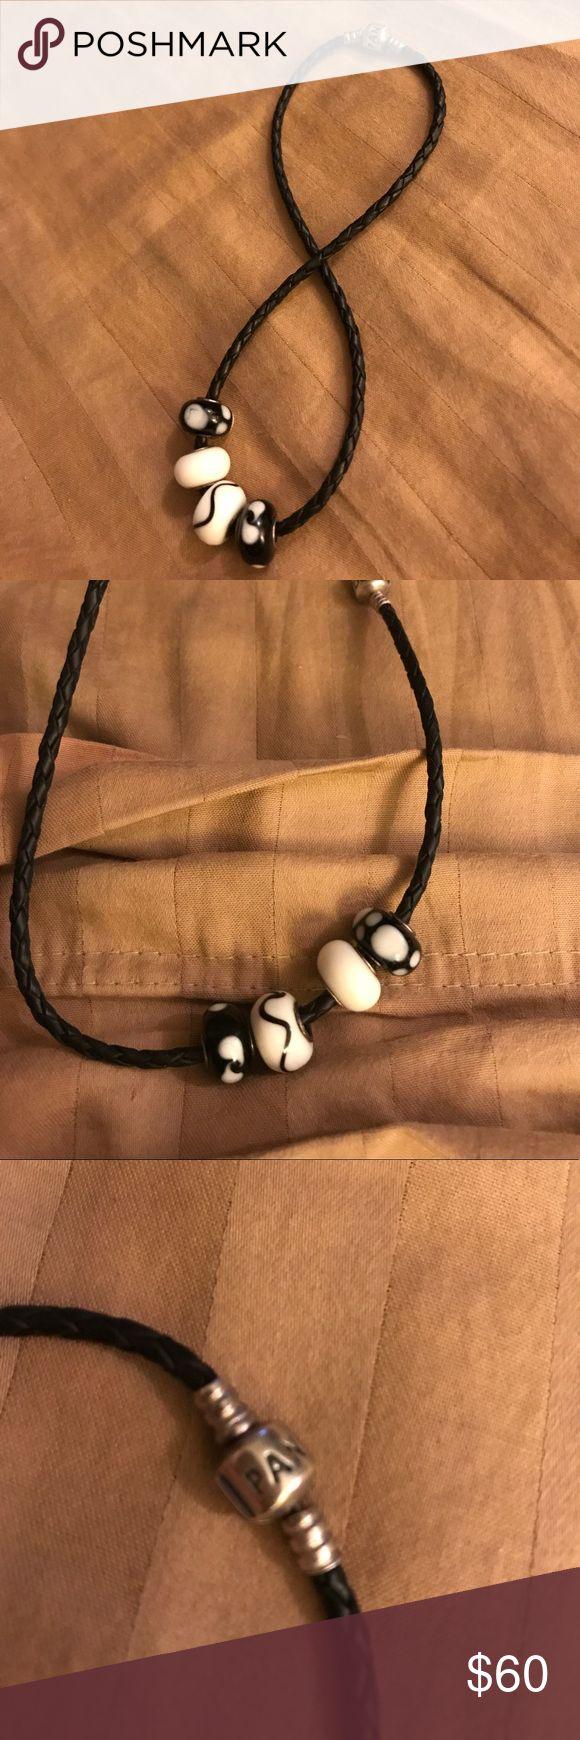 Pandora black rope bracket with 4 charms Pandora rope bracelet with 4 charms that are not pandora Pandora Jewelry Bracelets